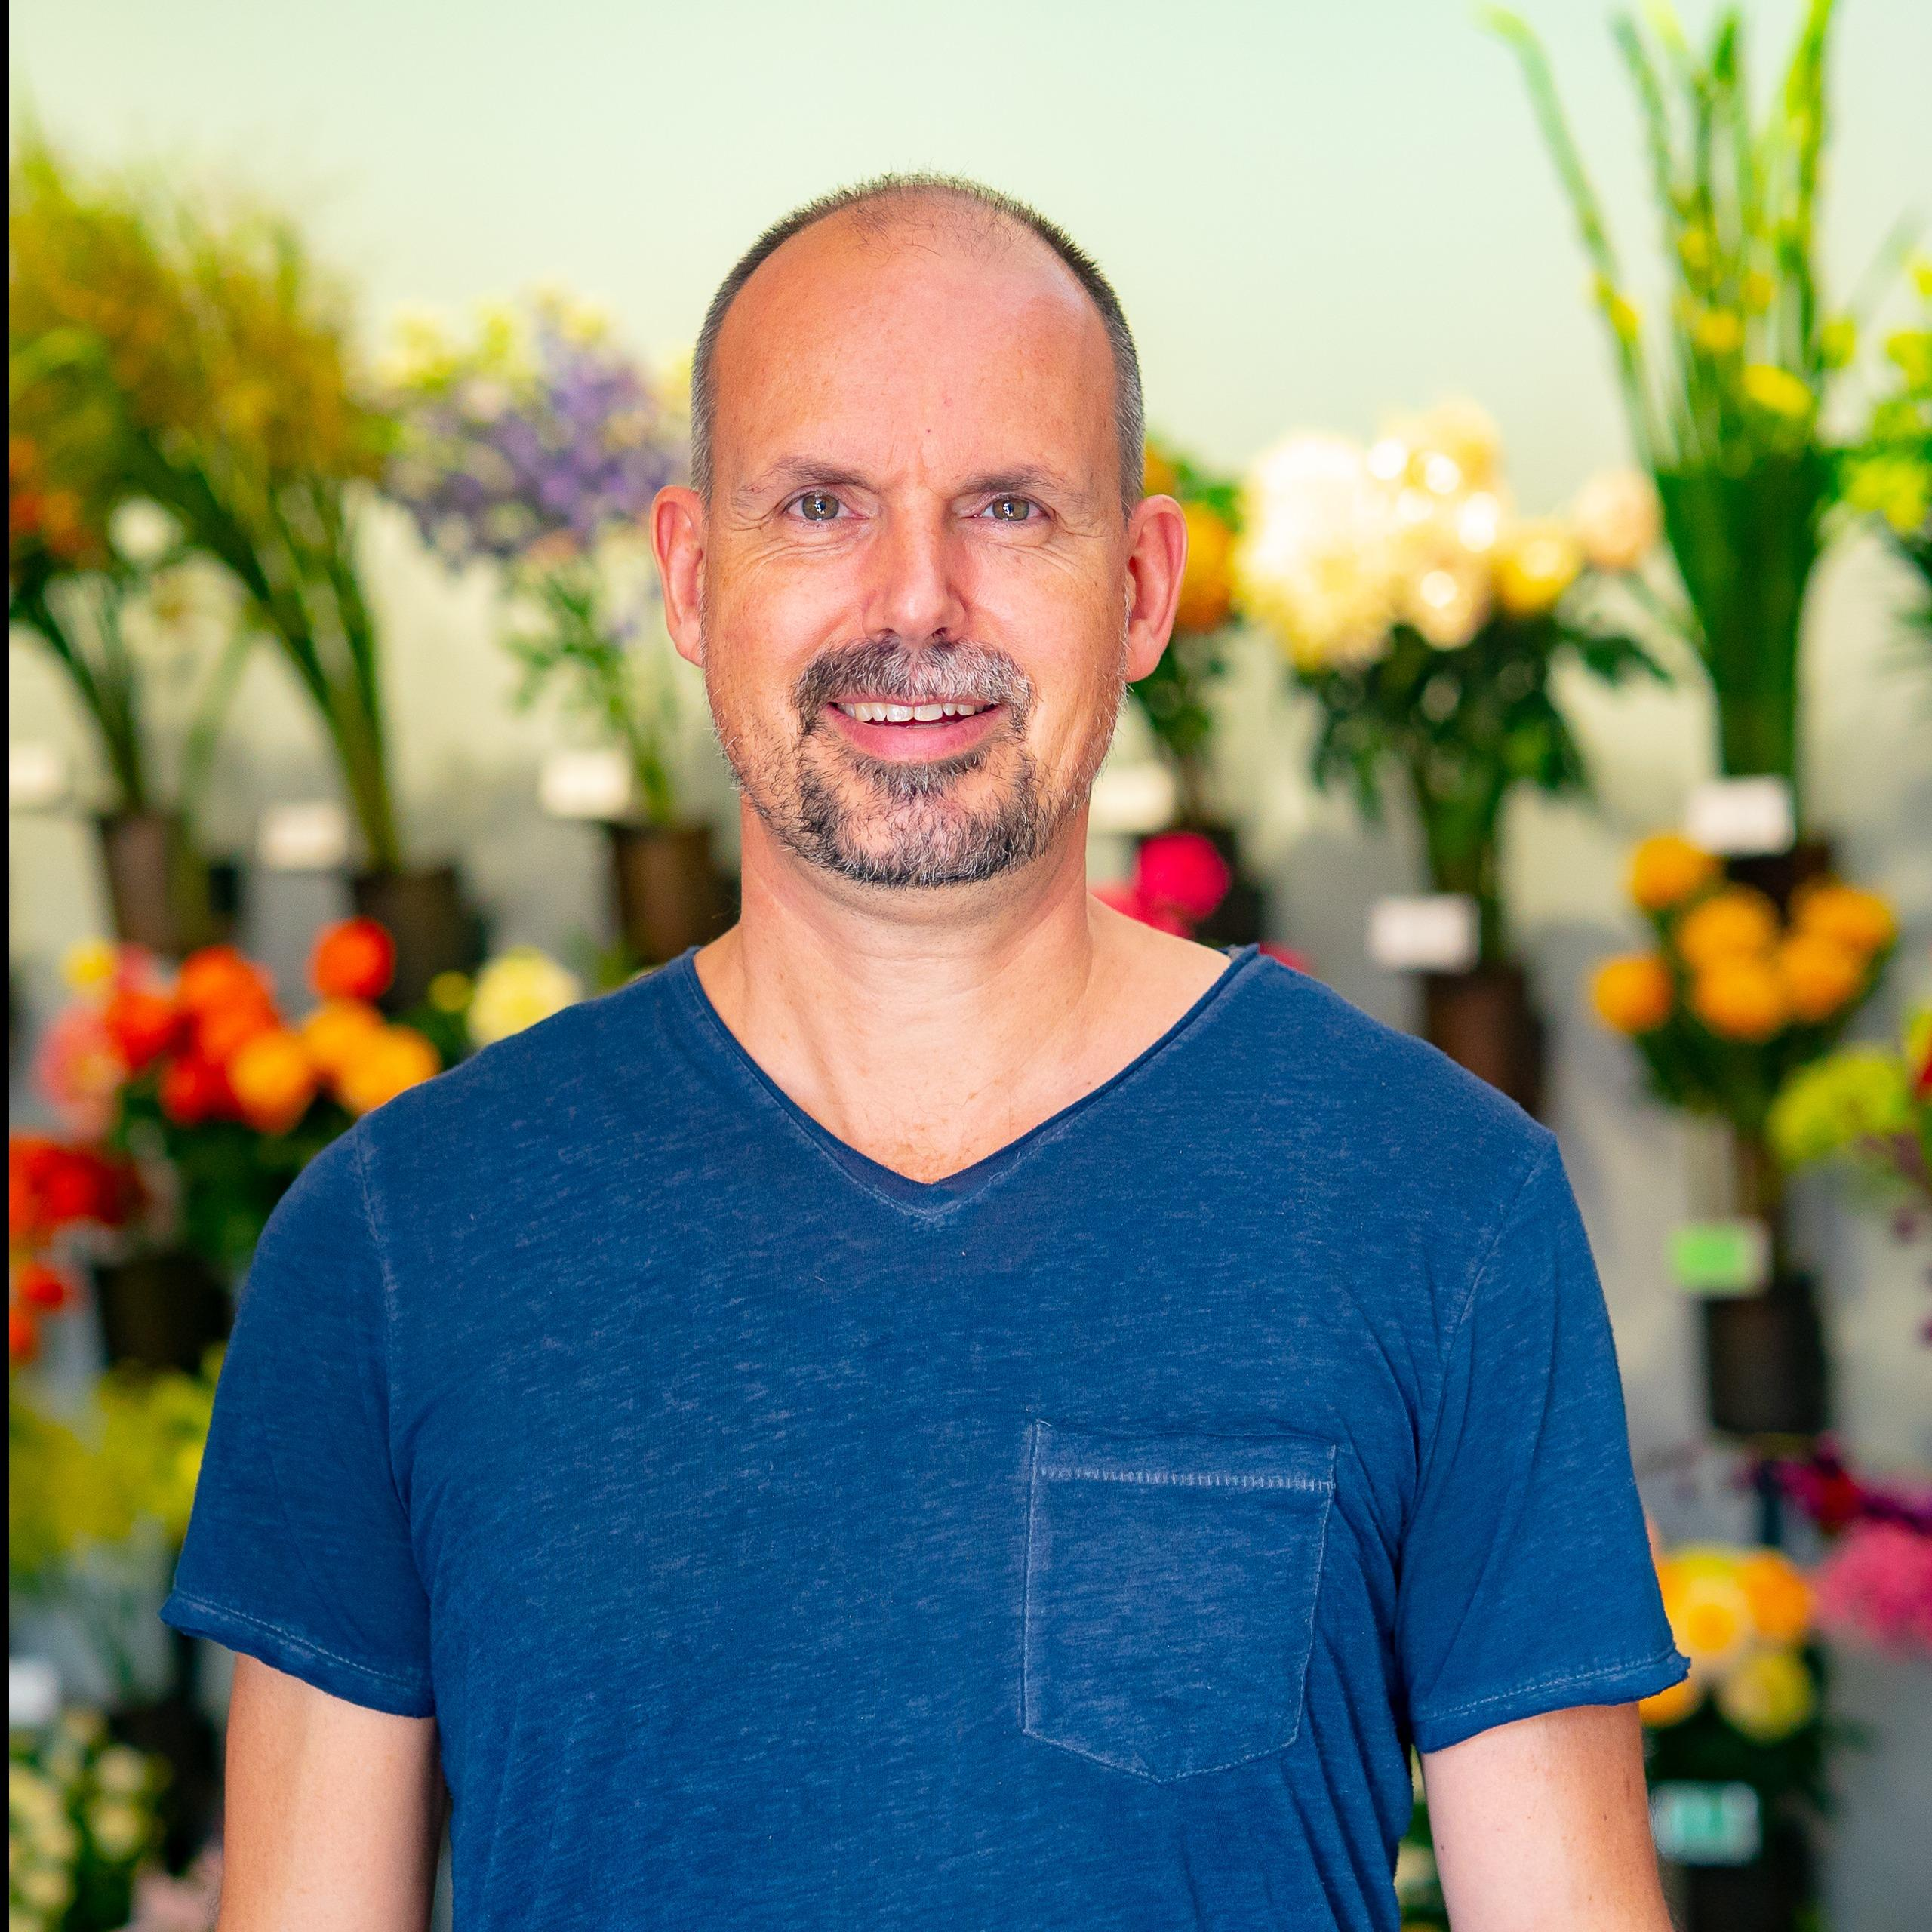 Bram Serre, CEO of URBANBLOOM